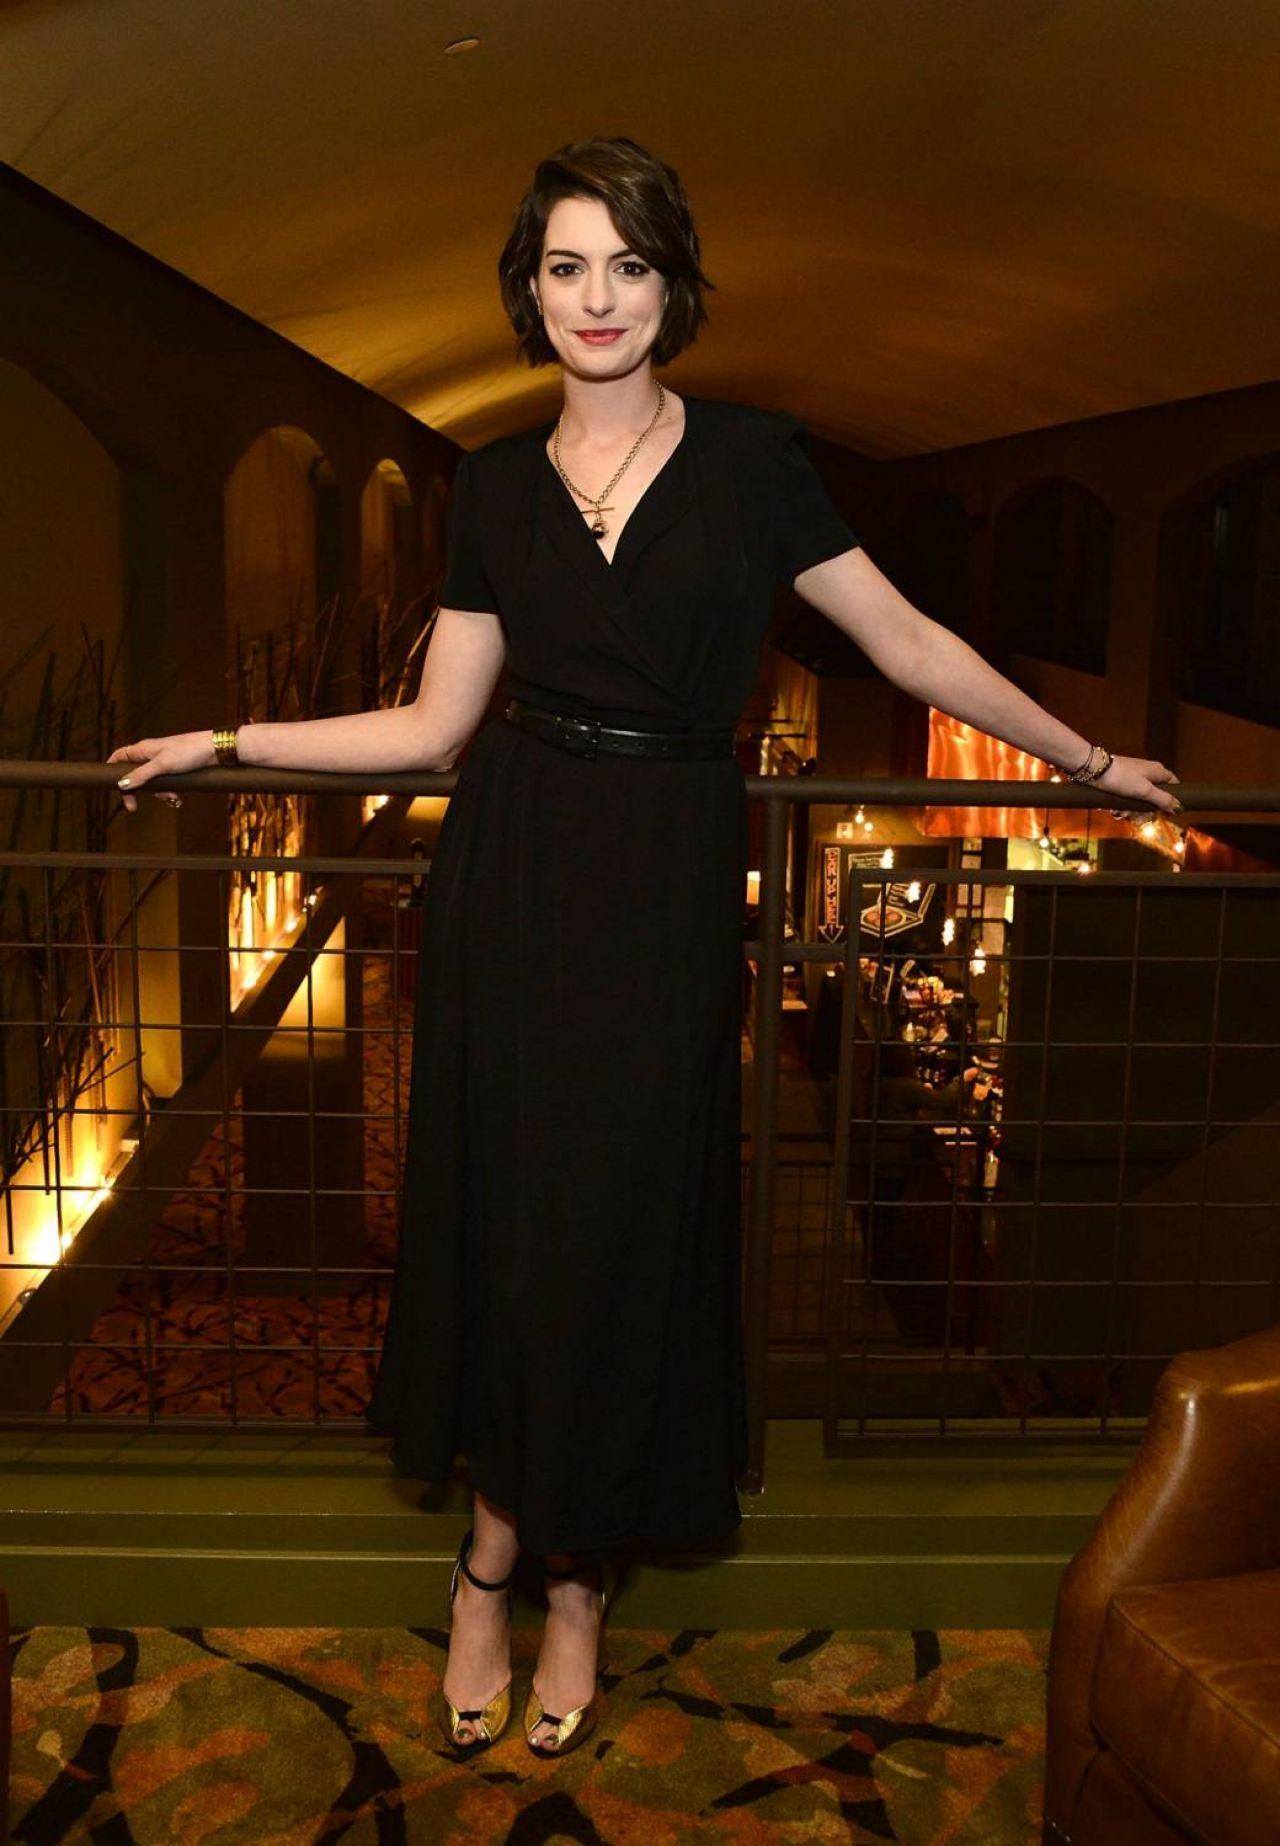 Anne Hathaway - L.A. Times